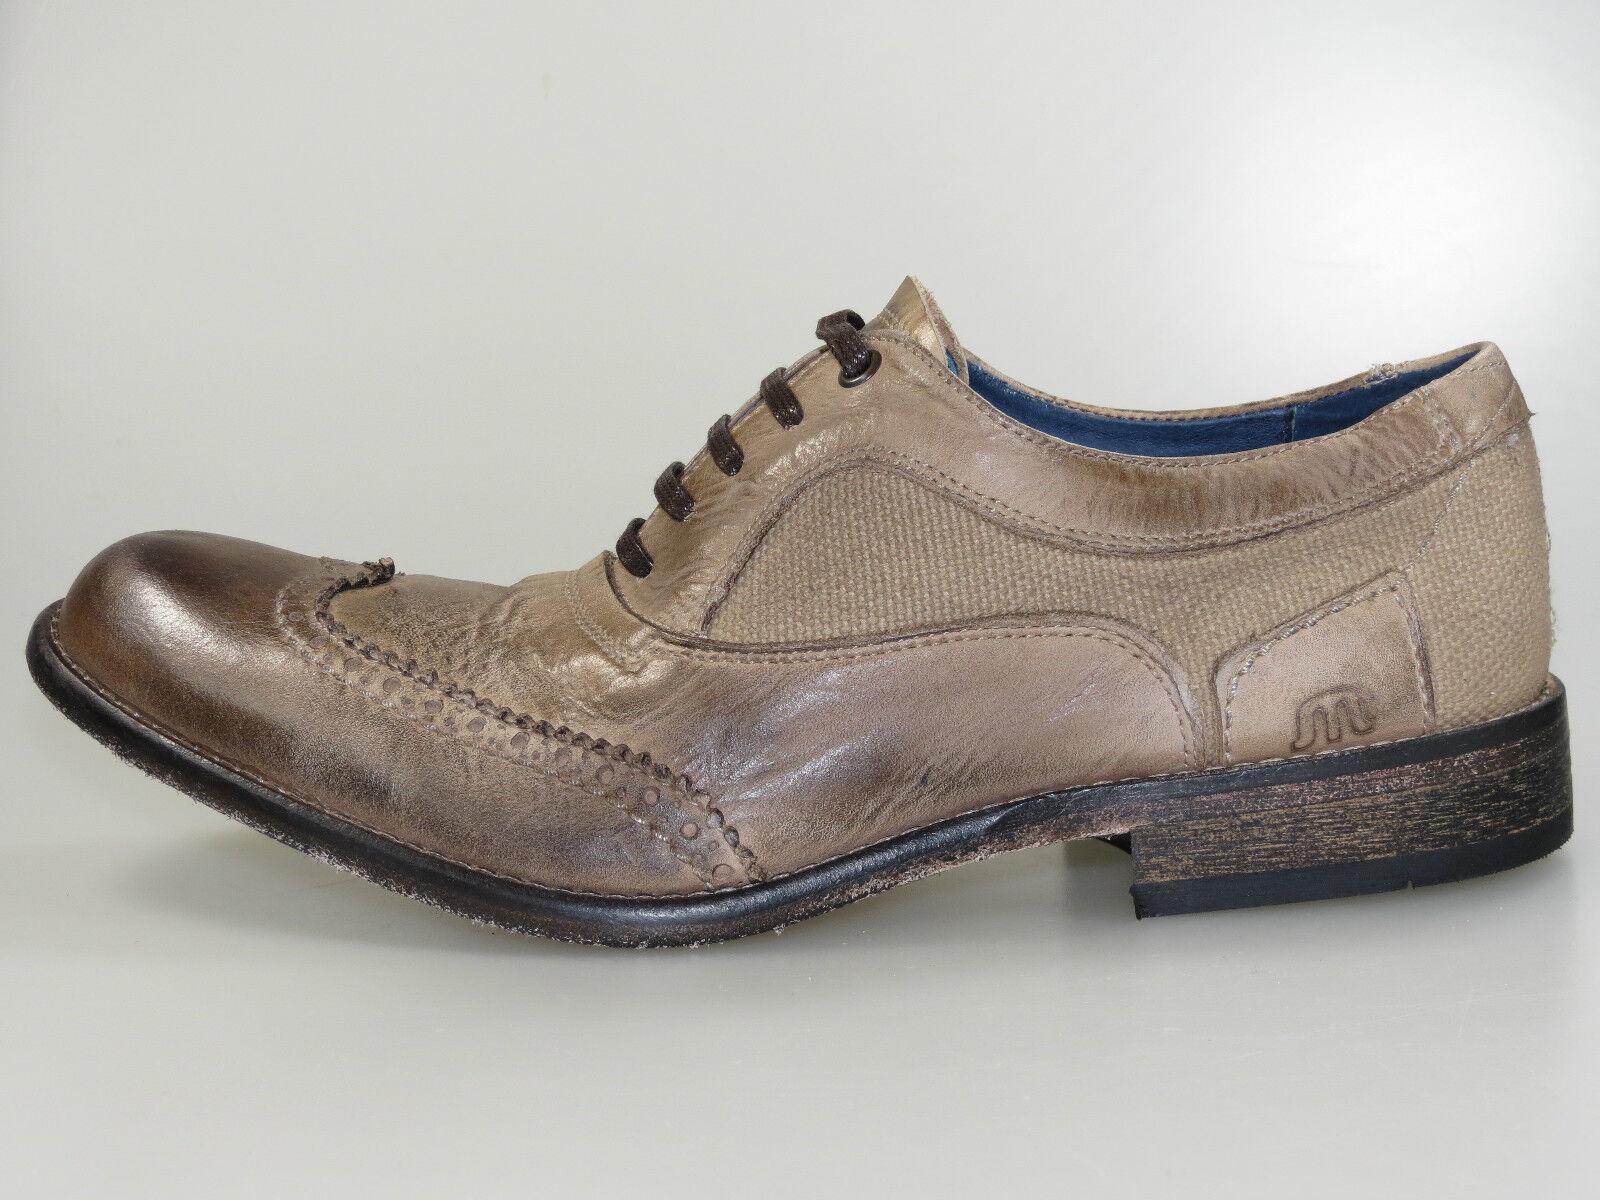 Maruti Schuhe Siena Men 66.20147.2057 brown canvas Leder braun +NEU+